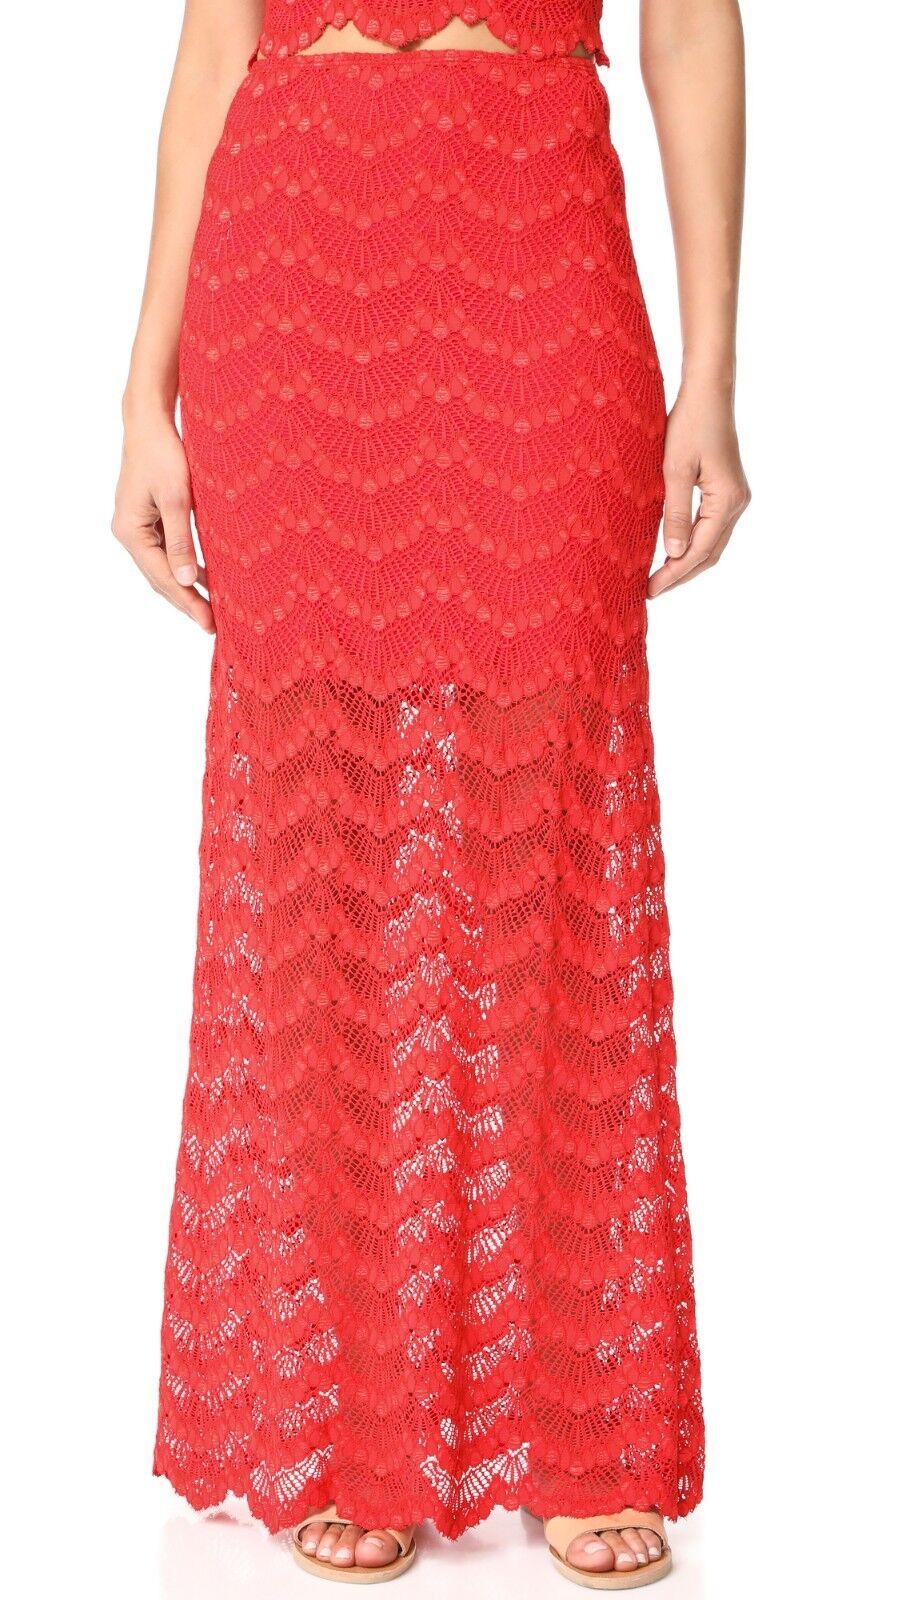 NWT, Nightcap Mariposa Lace Maxi Skirt Medium Nightcap Size 3 Red Guava, New